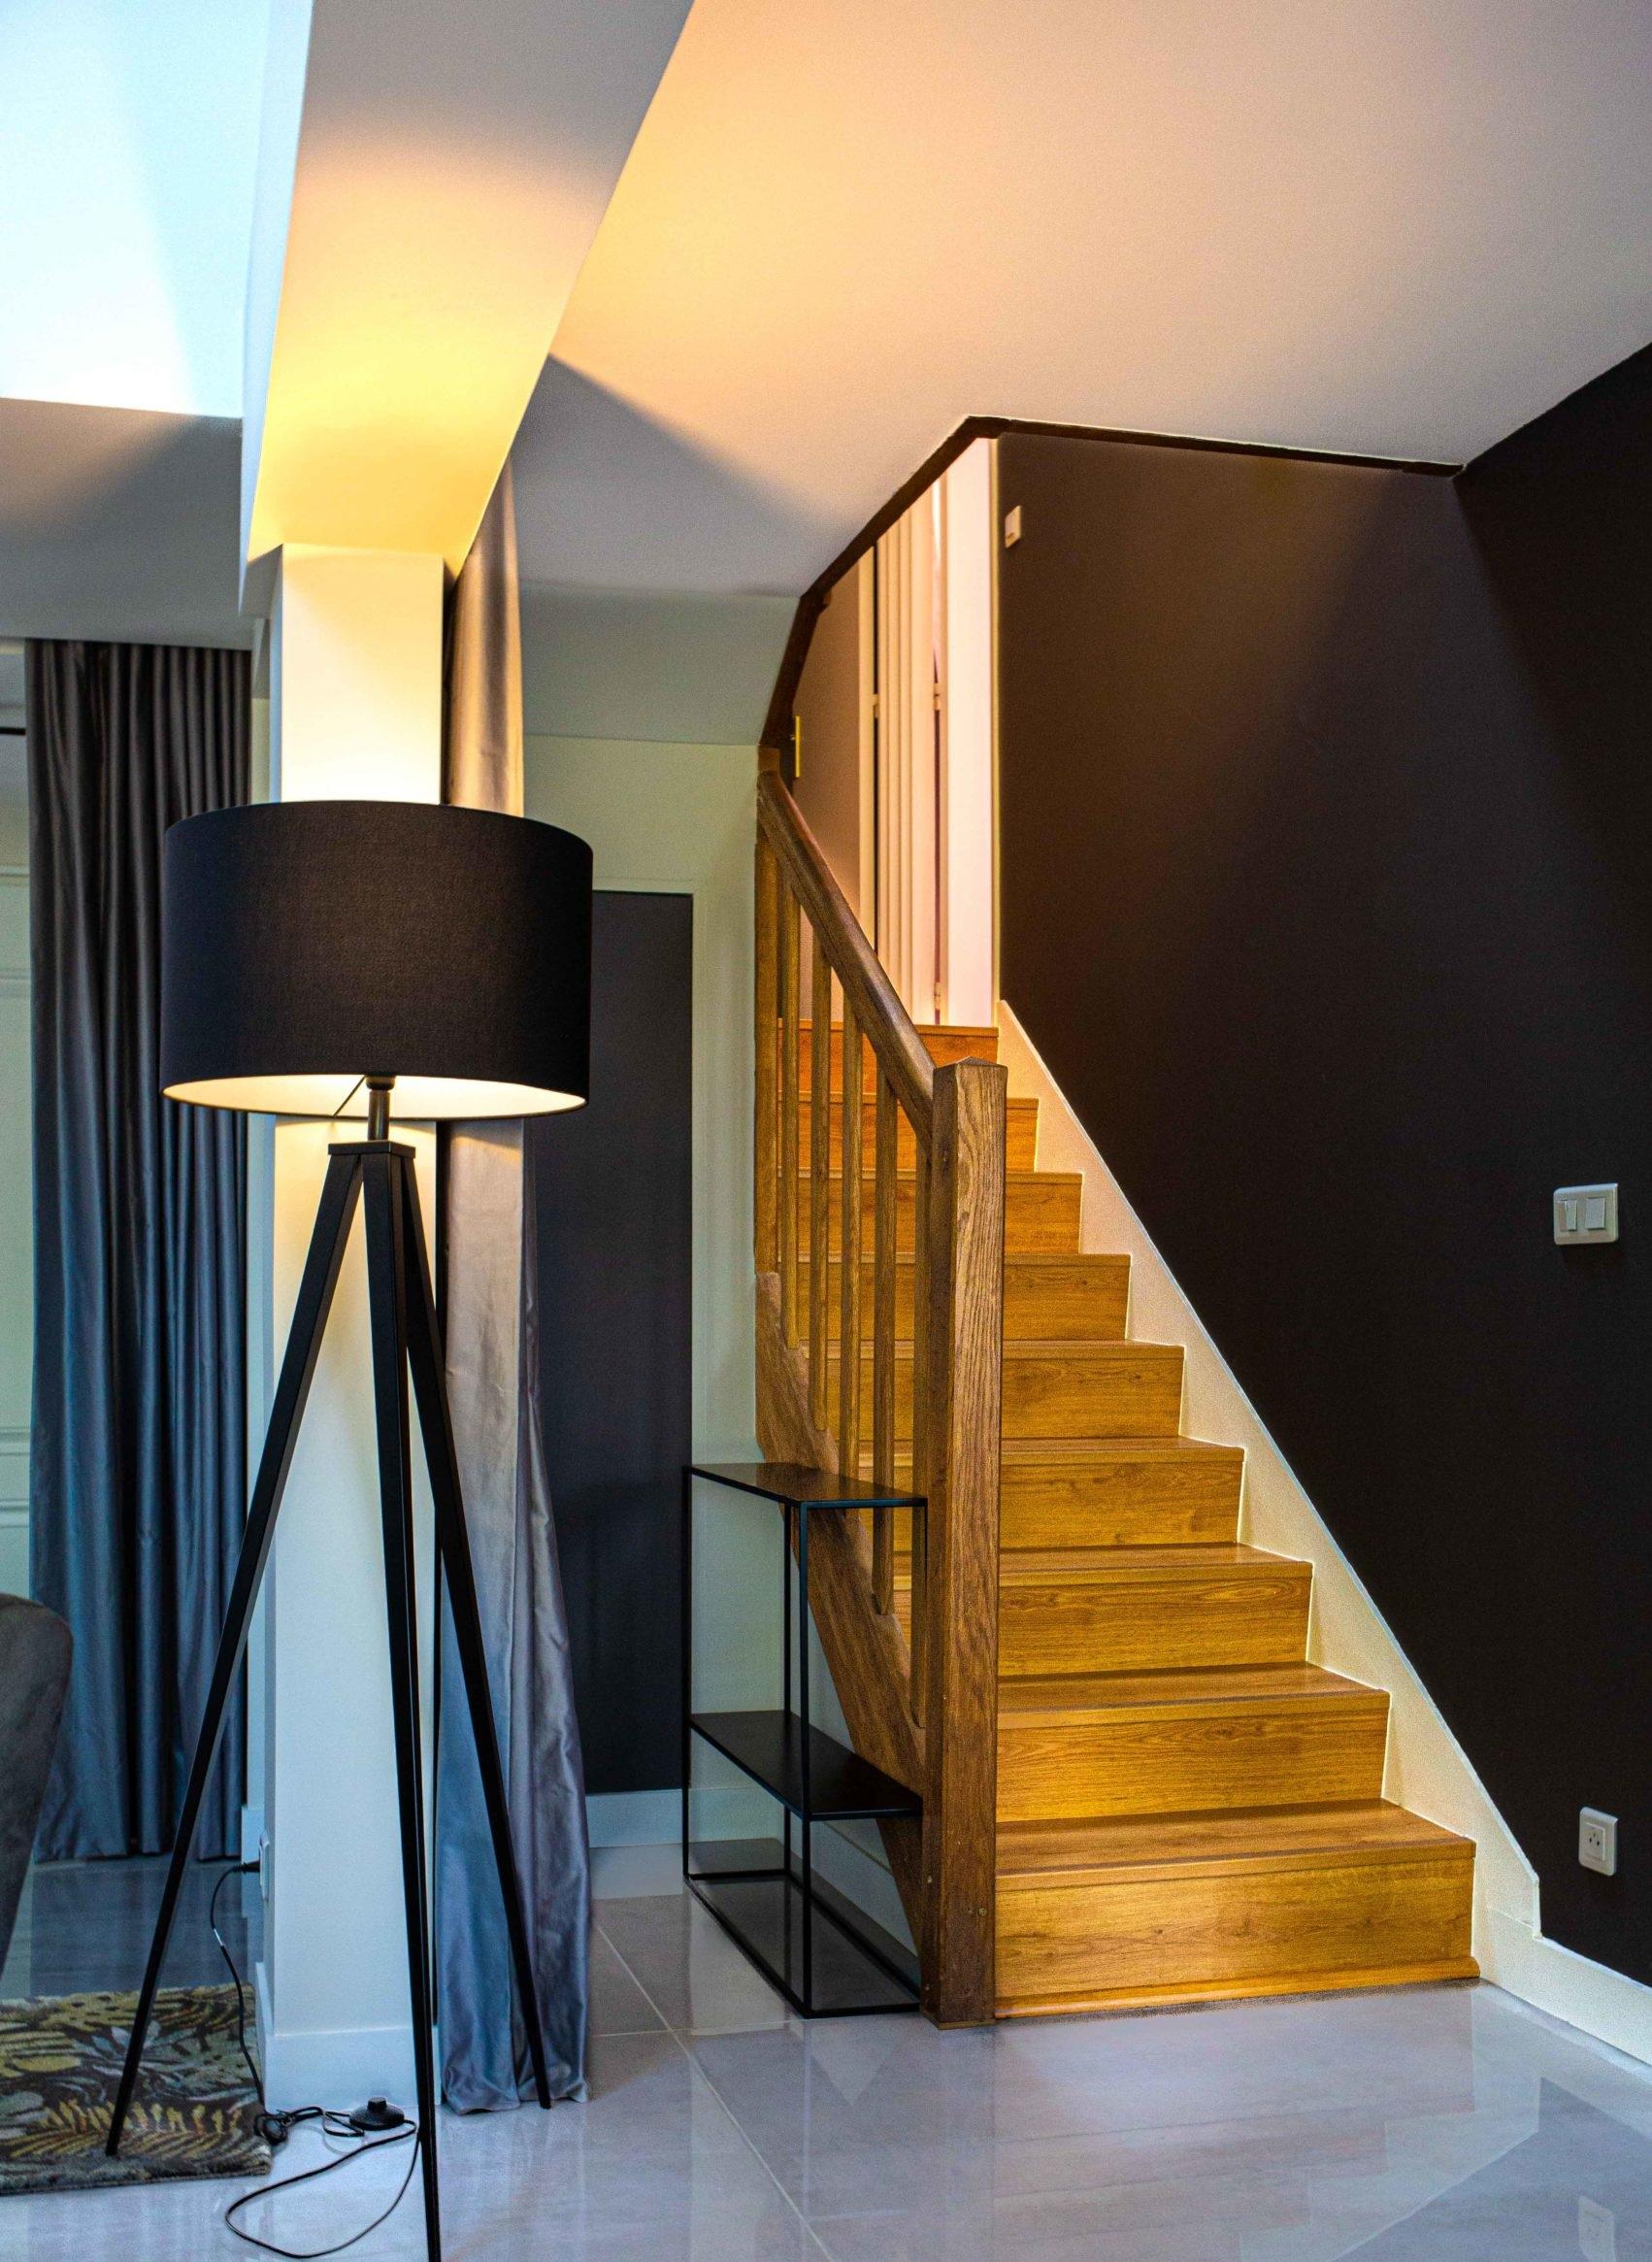 mh-deco-taverny-cage-escalier